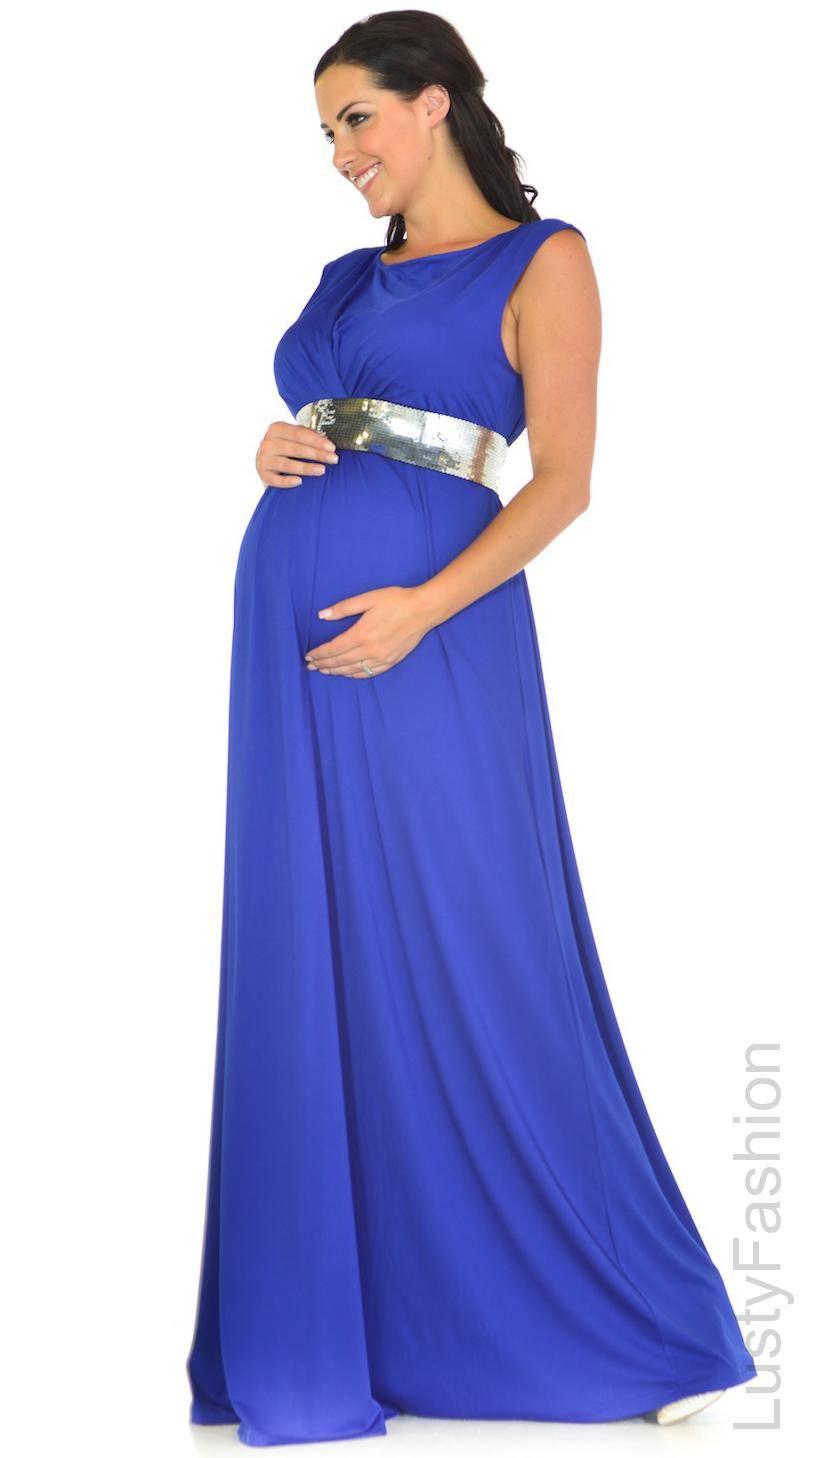 Royal blue formal maternity dress maternity dresses pinterest royal blue formal maternity dress ombrellifo Choice Image